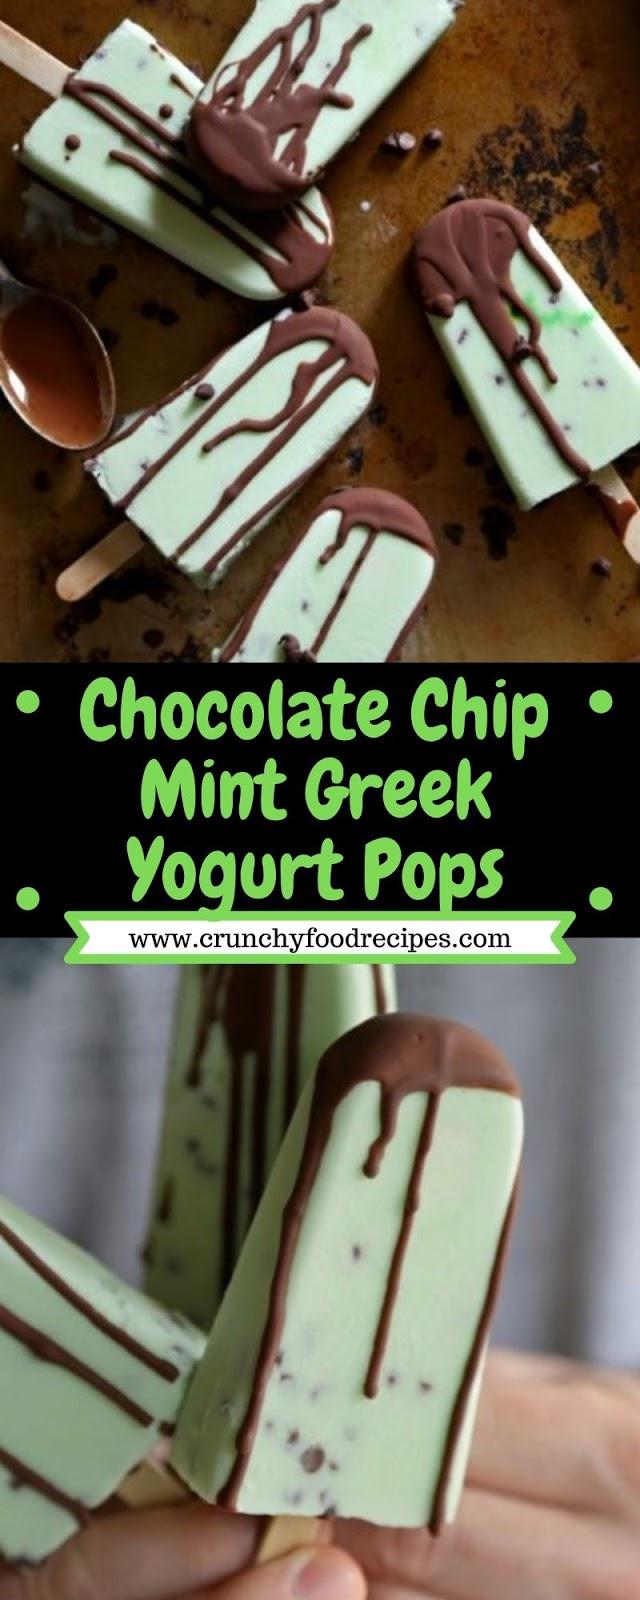 Chocolate Chip Mint Greek Yogurt Pops